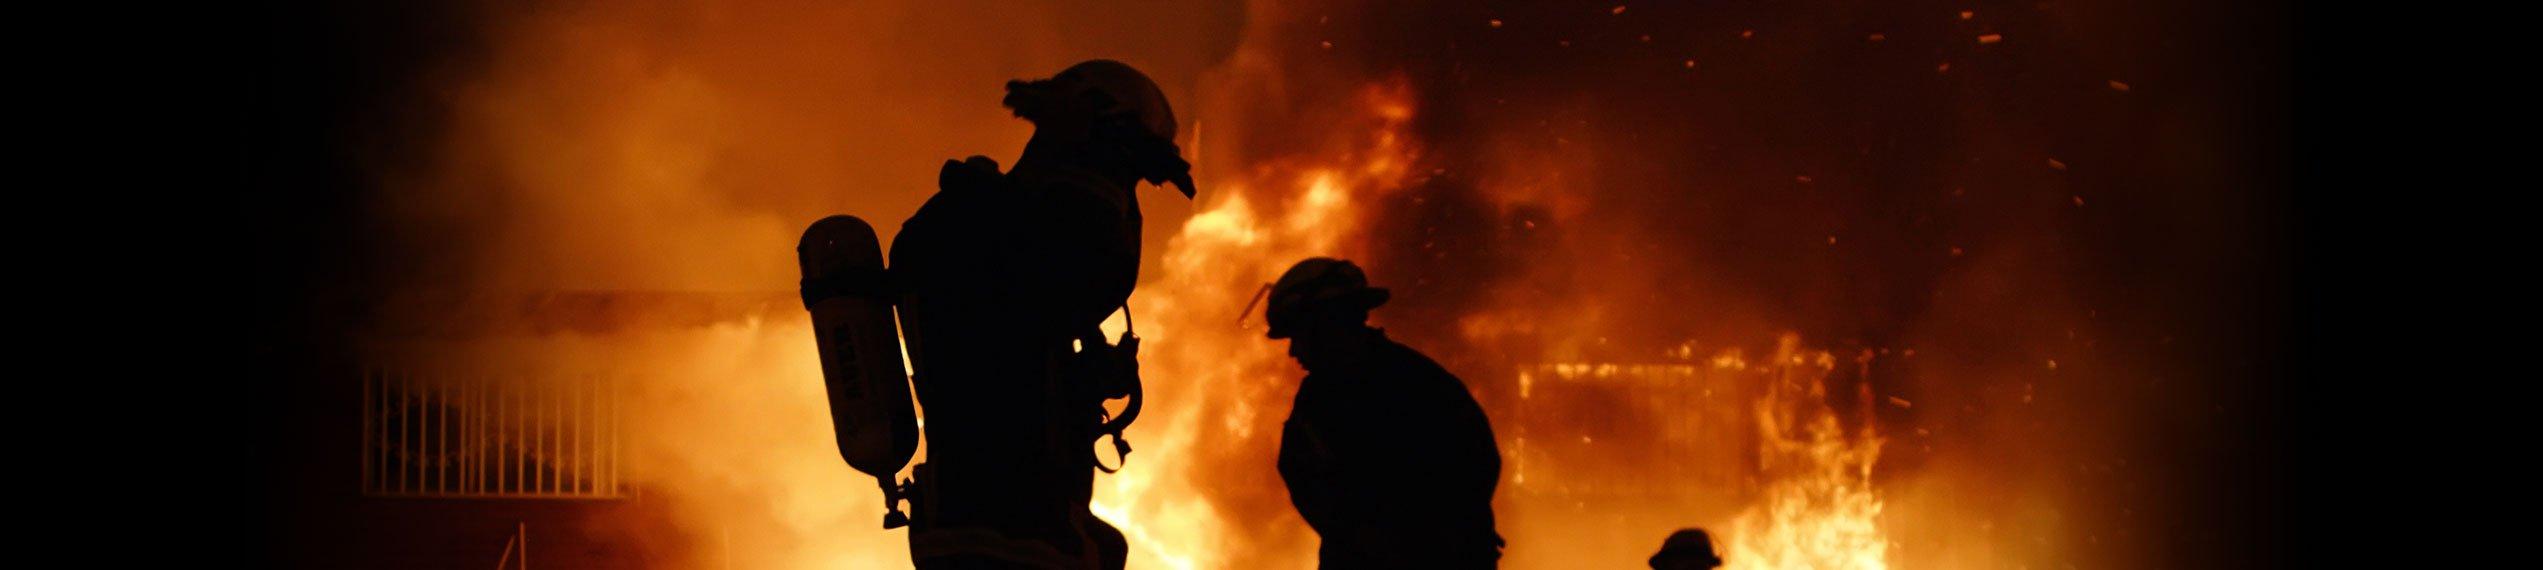 Fire & Smoke Damage Removal in Paul Davis Restoration & Remodeling of Greater Charleston